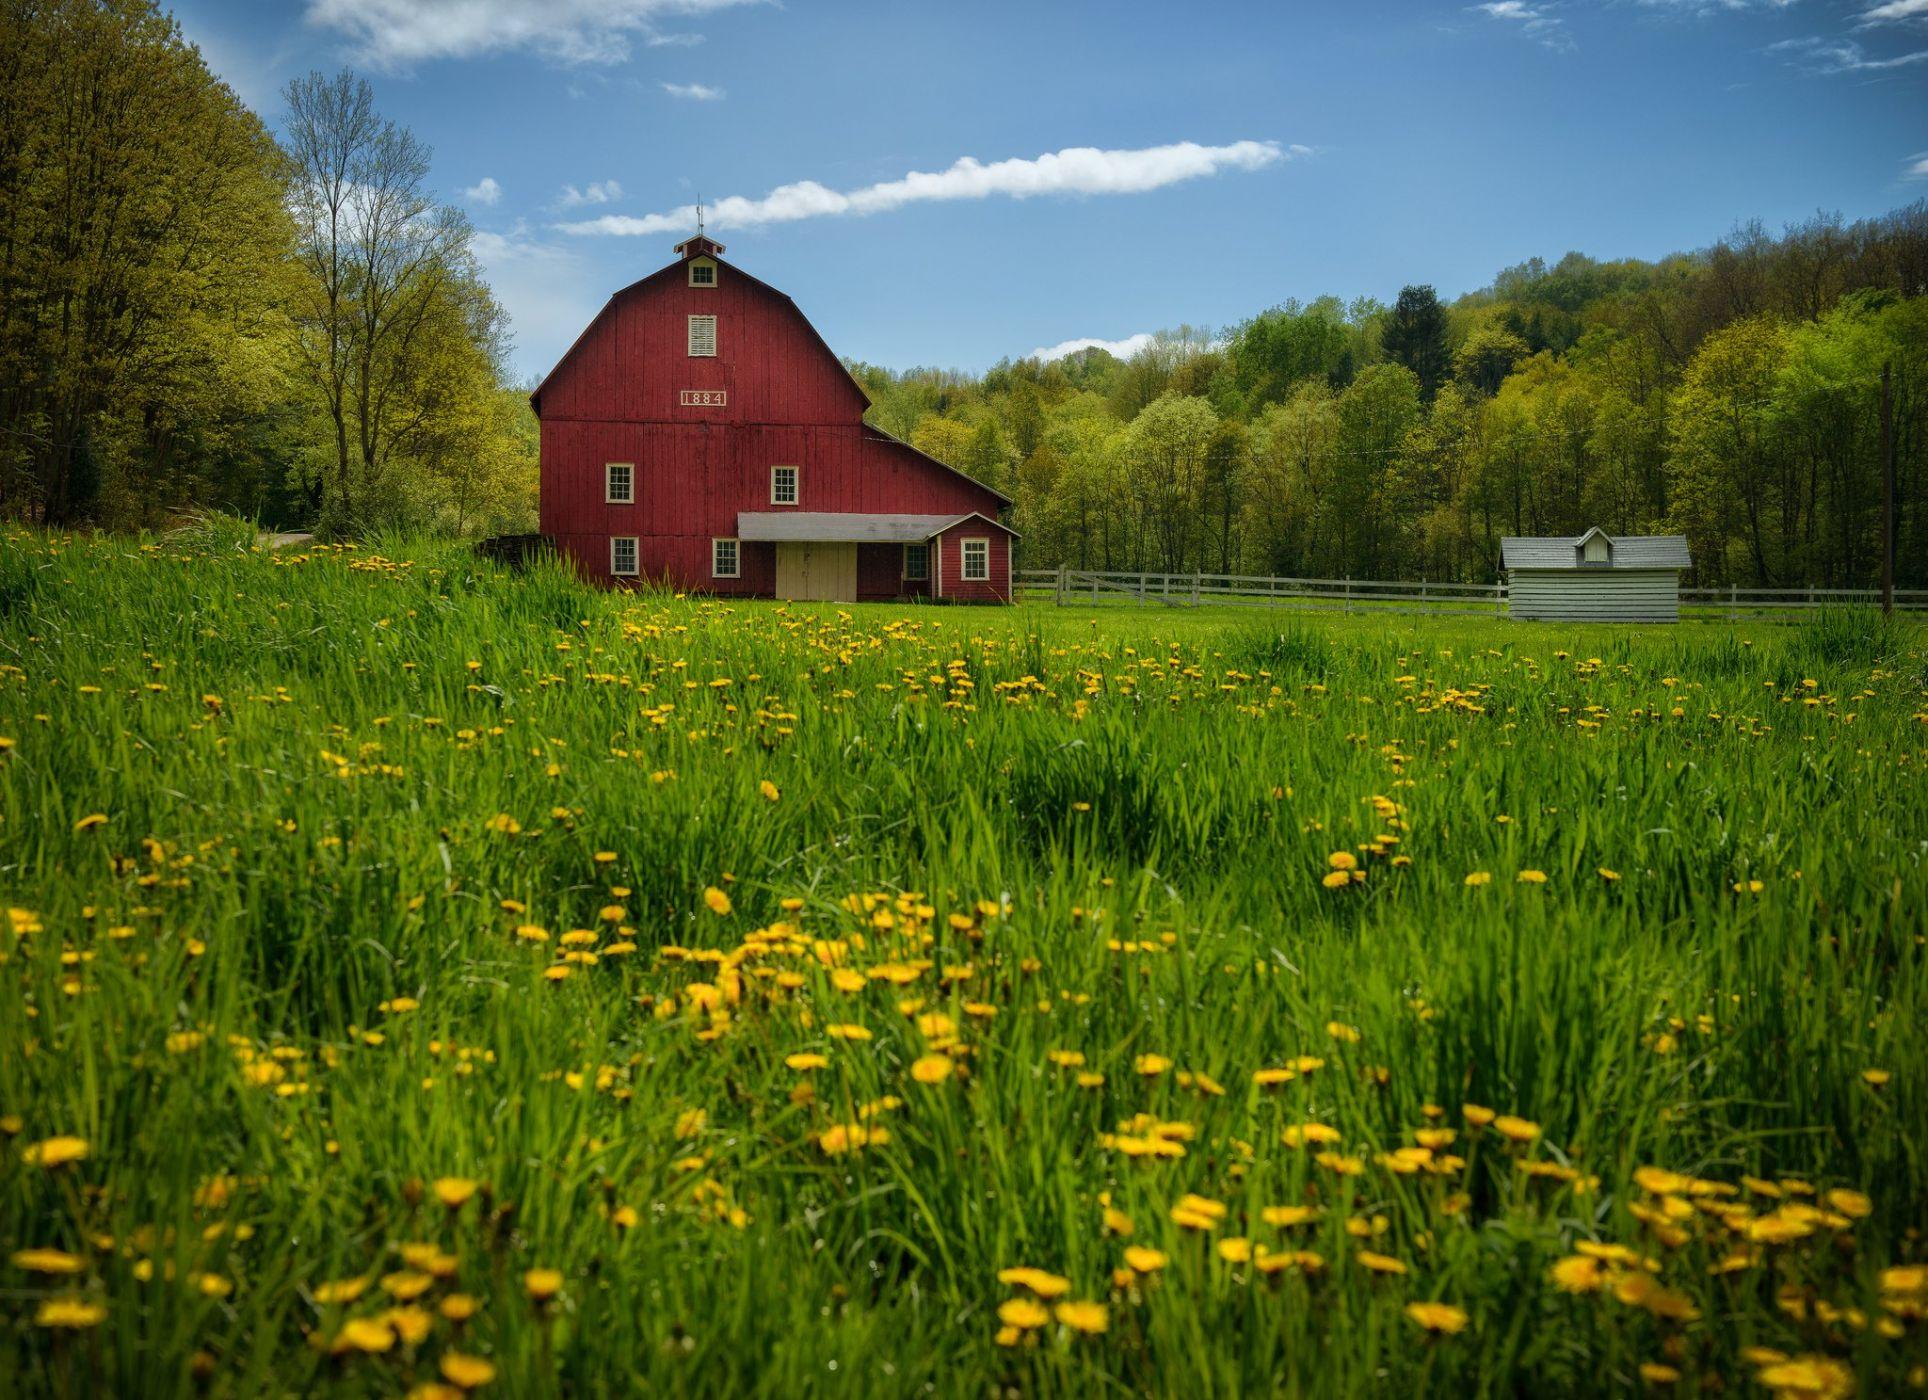 countryside home lien brilleslijper - HD1920×1080